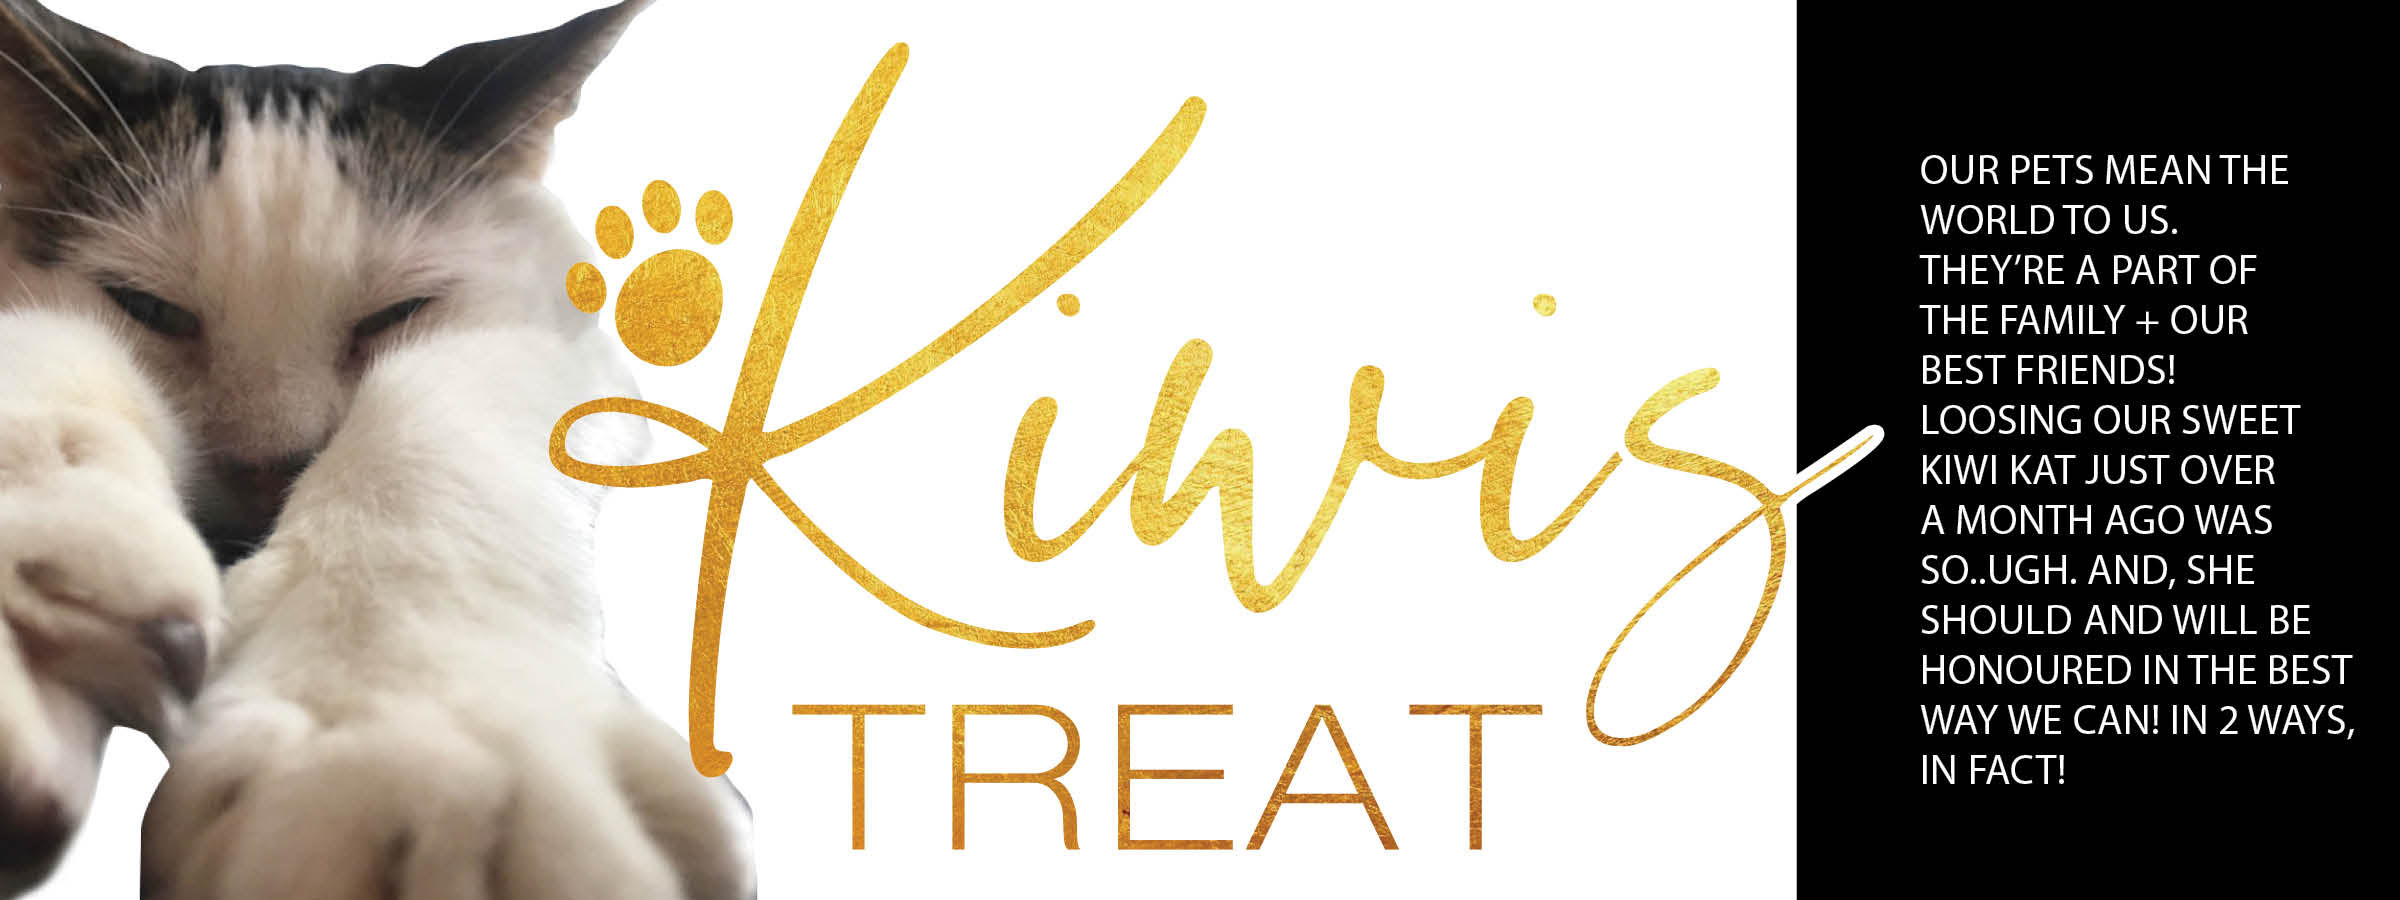 KIWIS TREAT FOR SITE.jpg